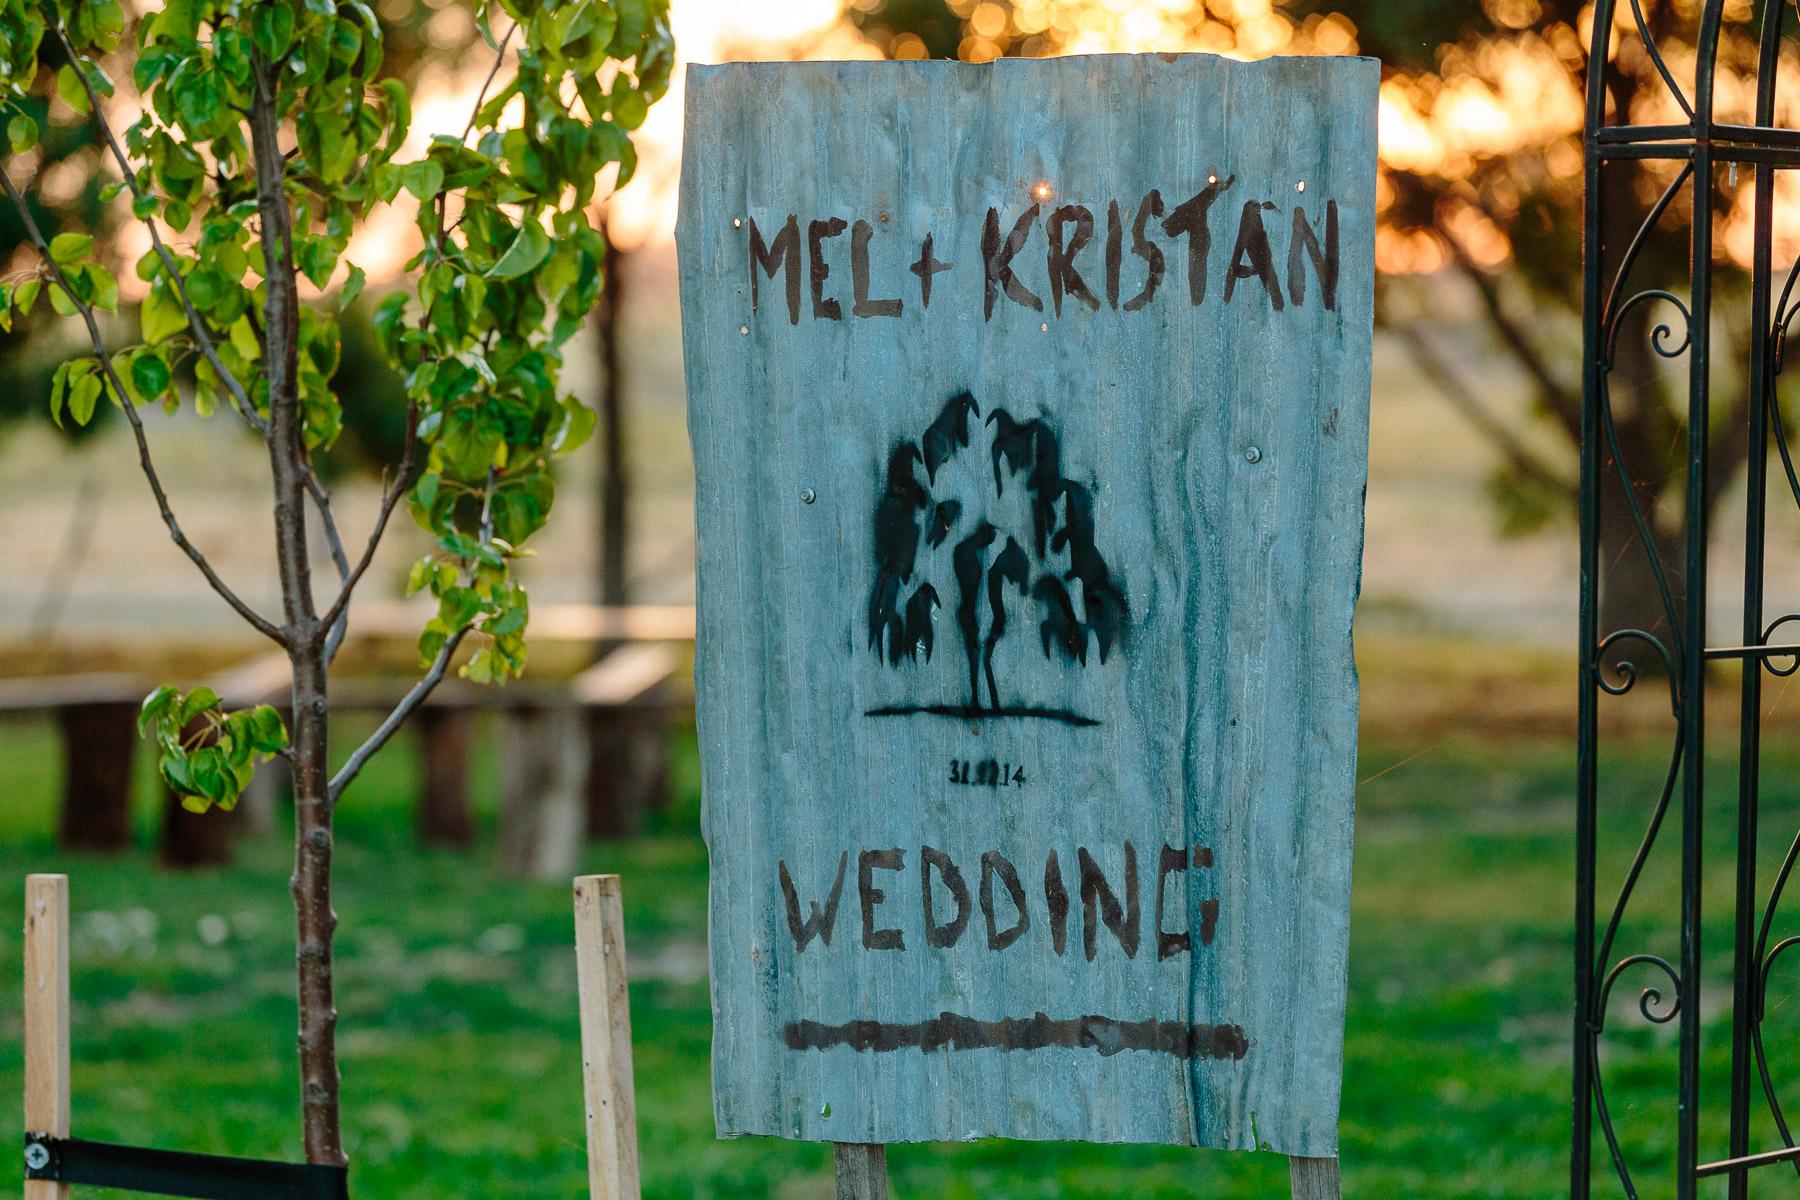 Melissa_and_Kristan_Echuca_Farm_Wedding_New_Years_Eve-115.jpg